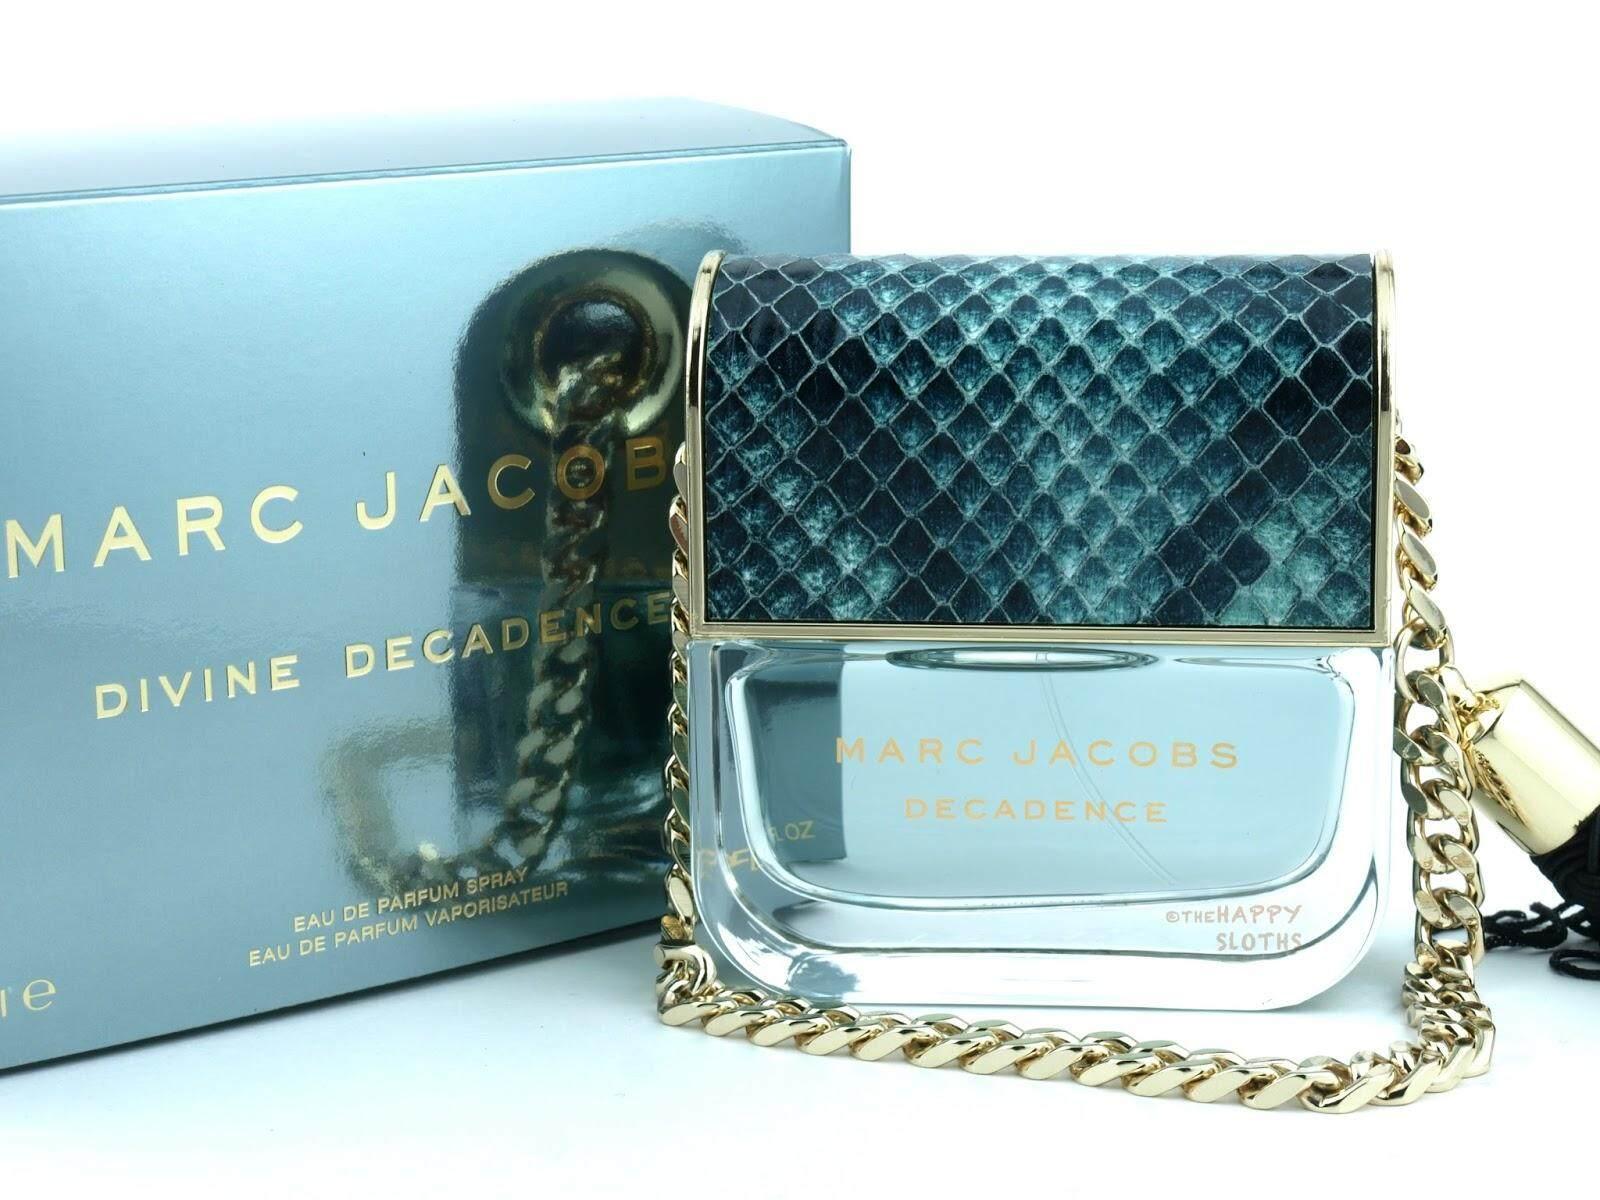 eb1a60dd5b08 Marc Jacobs Decadence Eau So Decadent For Women 100ml - Eau de Toilette  Original Quality Product